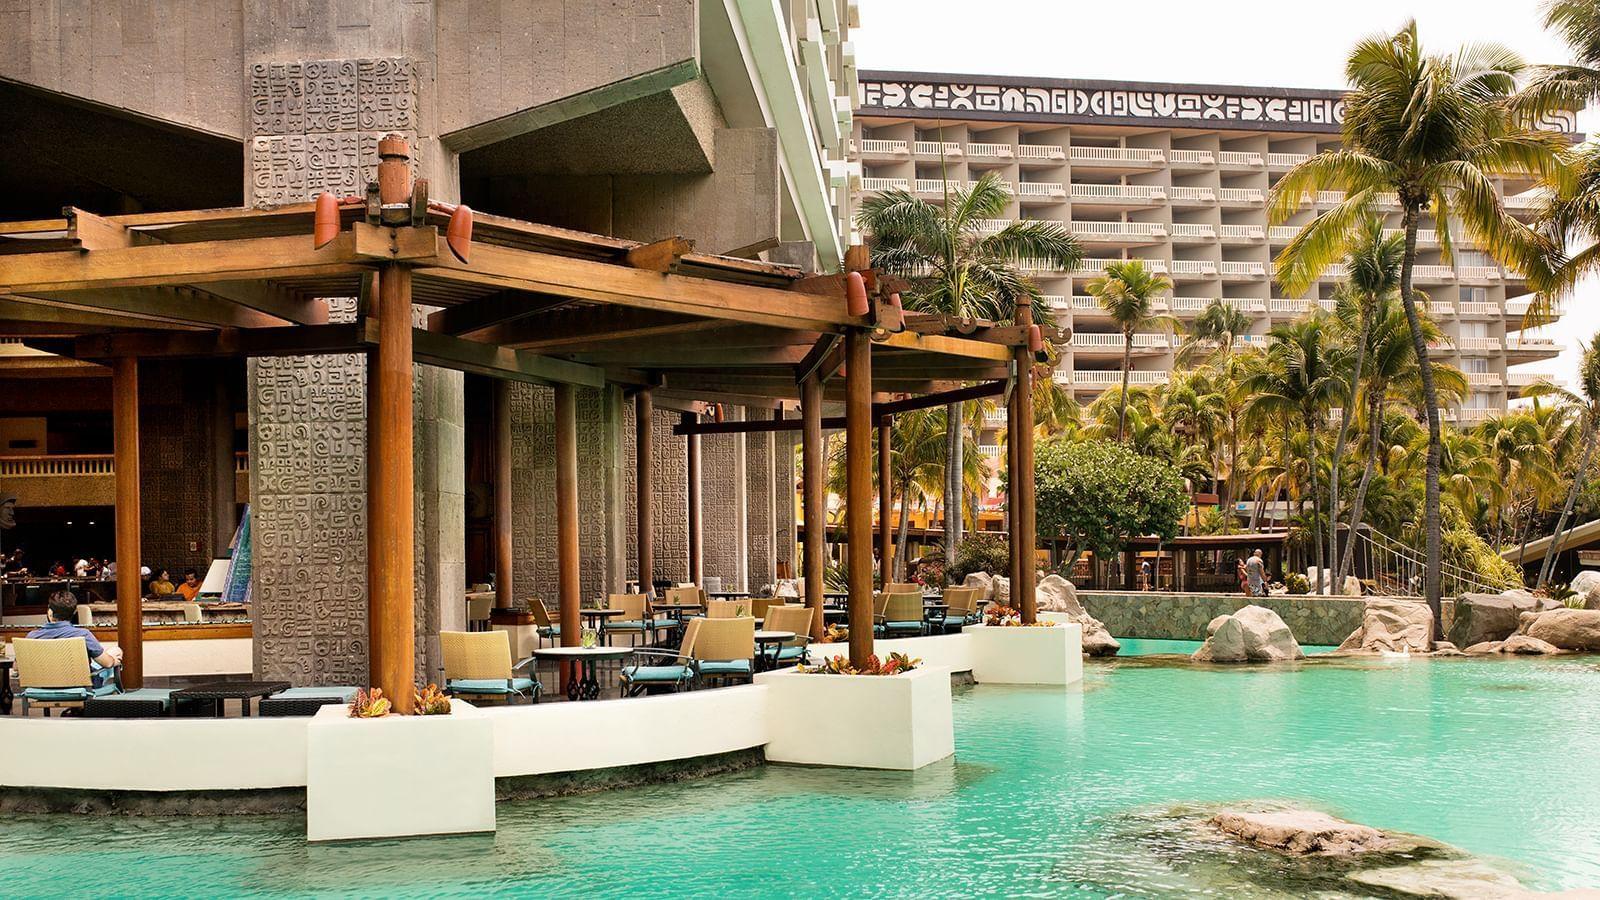 Outdoor seating area at Laguna Bar in Princess Mundo Imperial